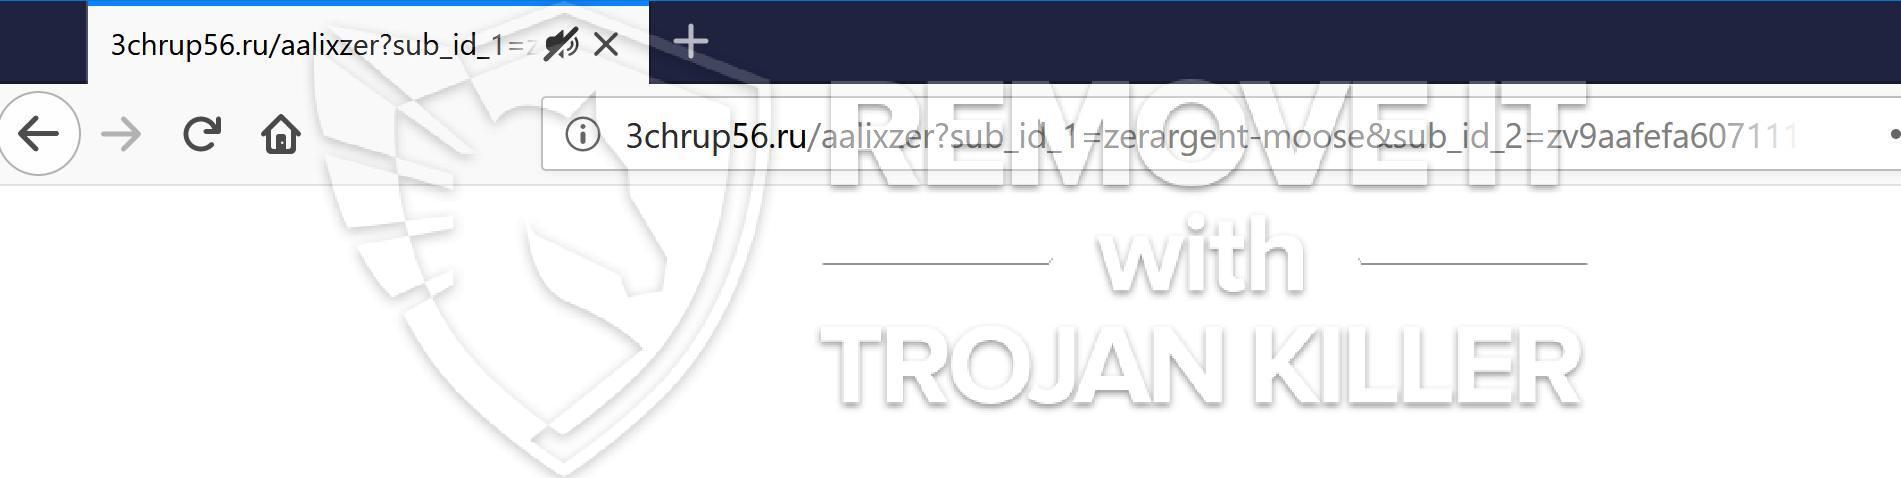 remove 3chrup56.ru virus